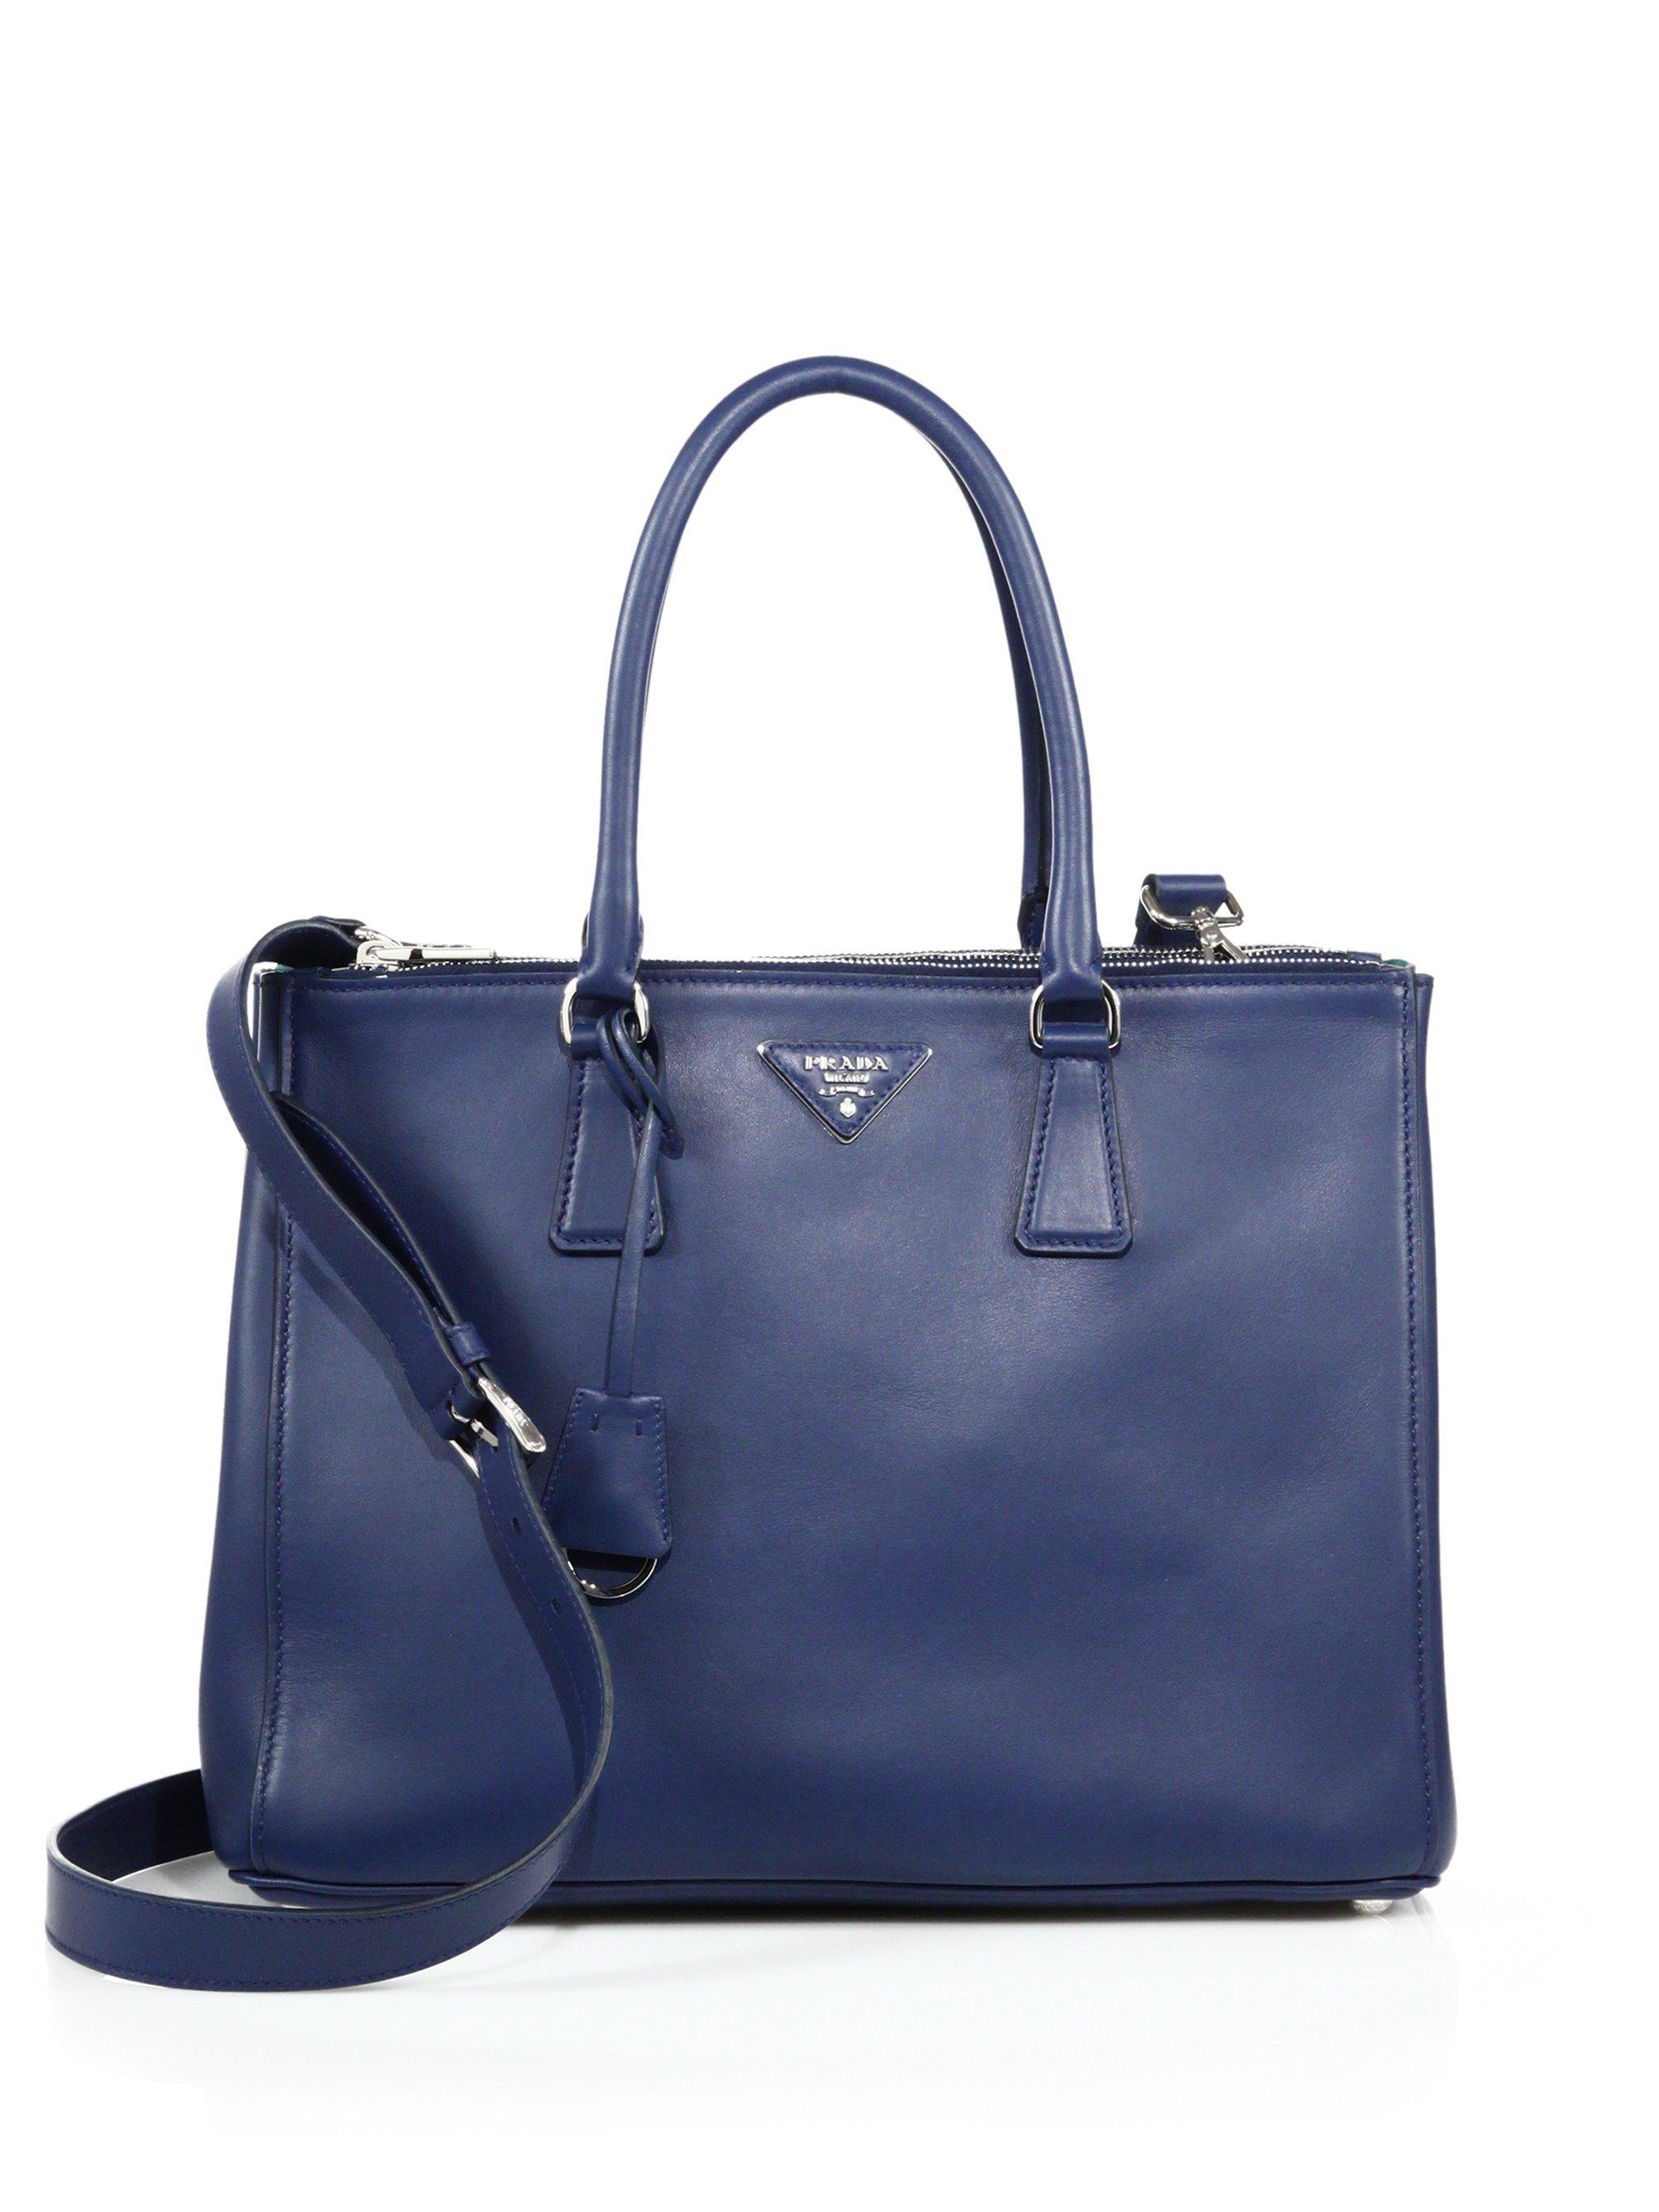 prada handbag sale - Prada City Calf Medium Double-zip Tote in Blue (bluette) | Lyst